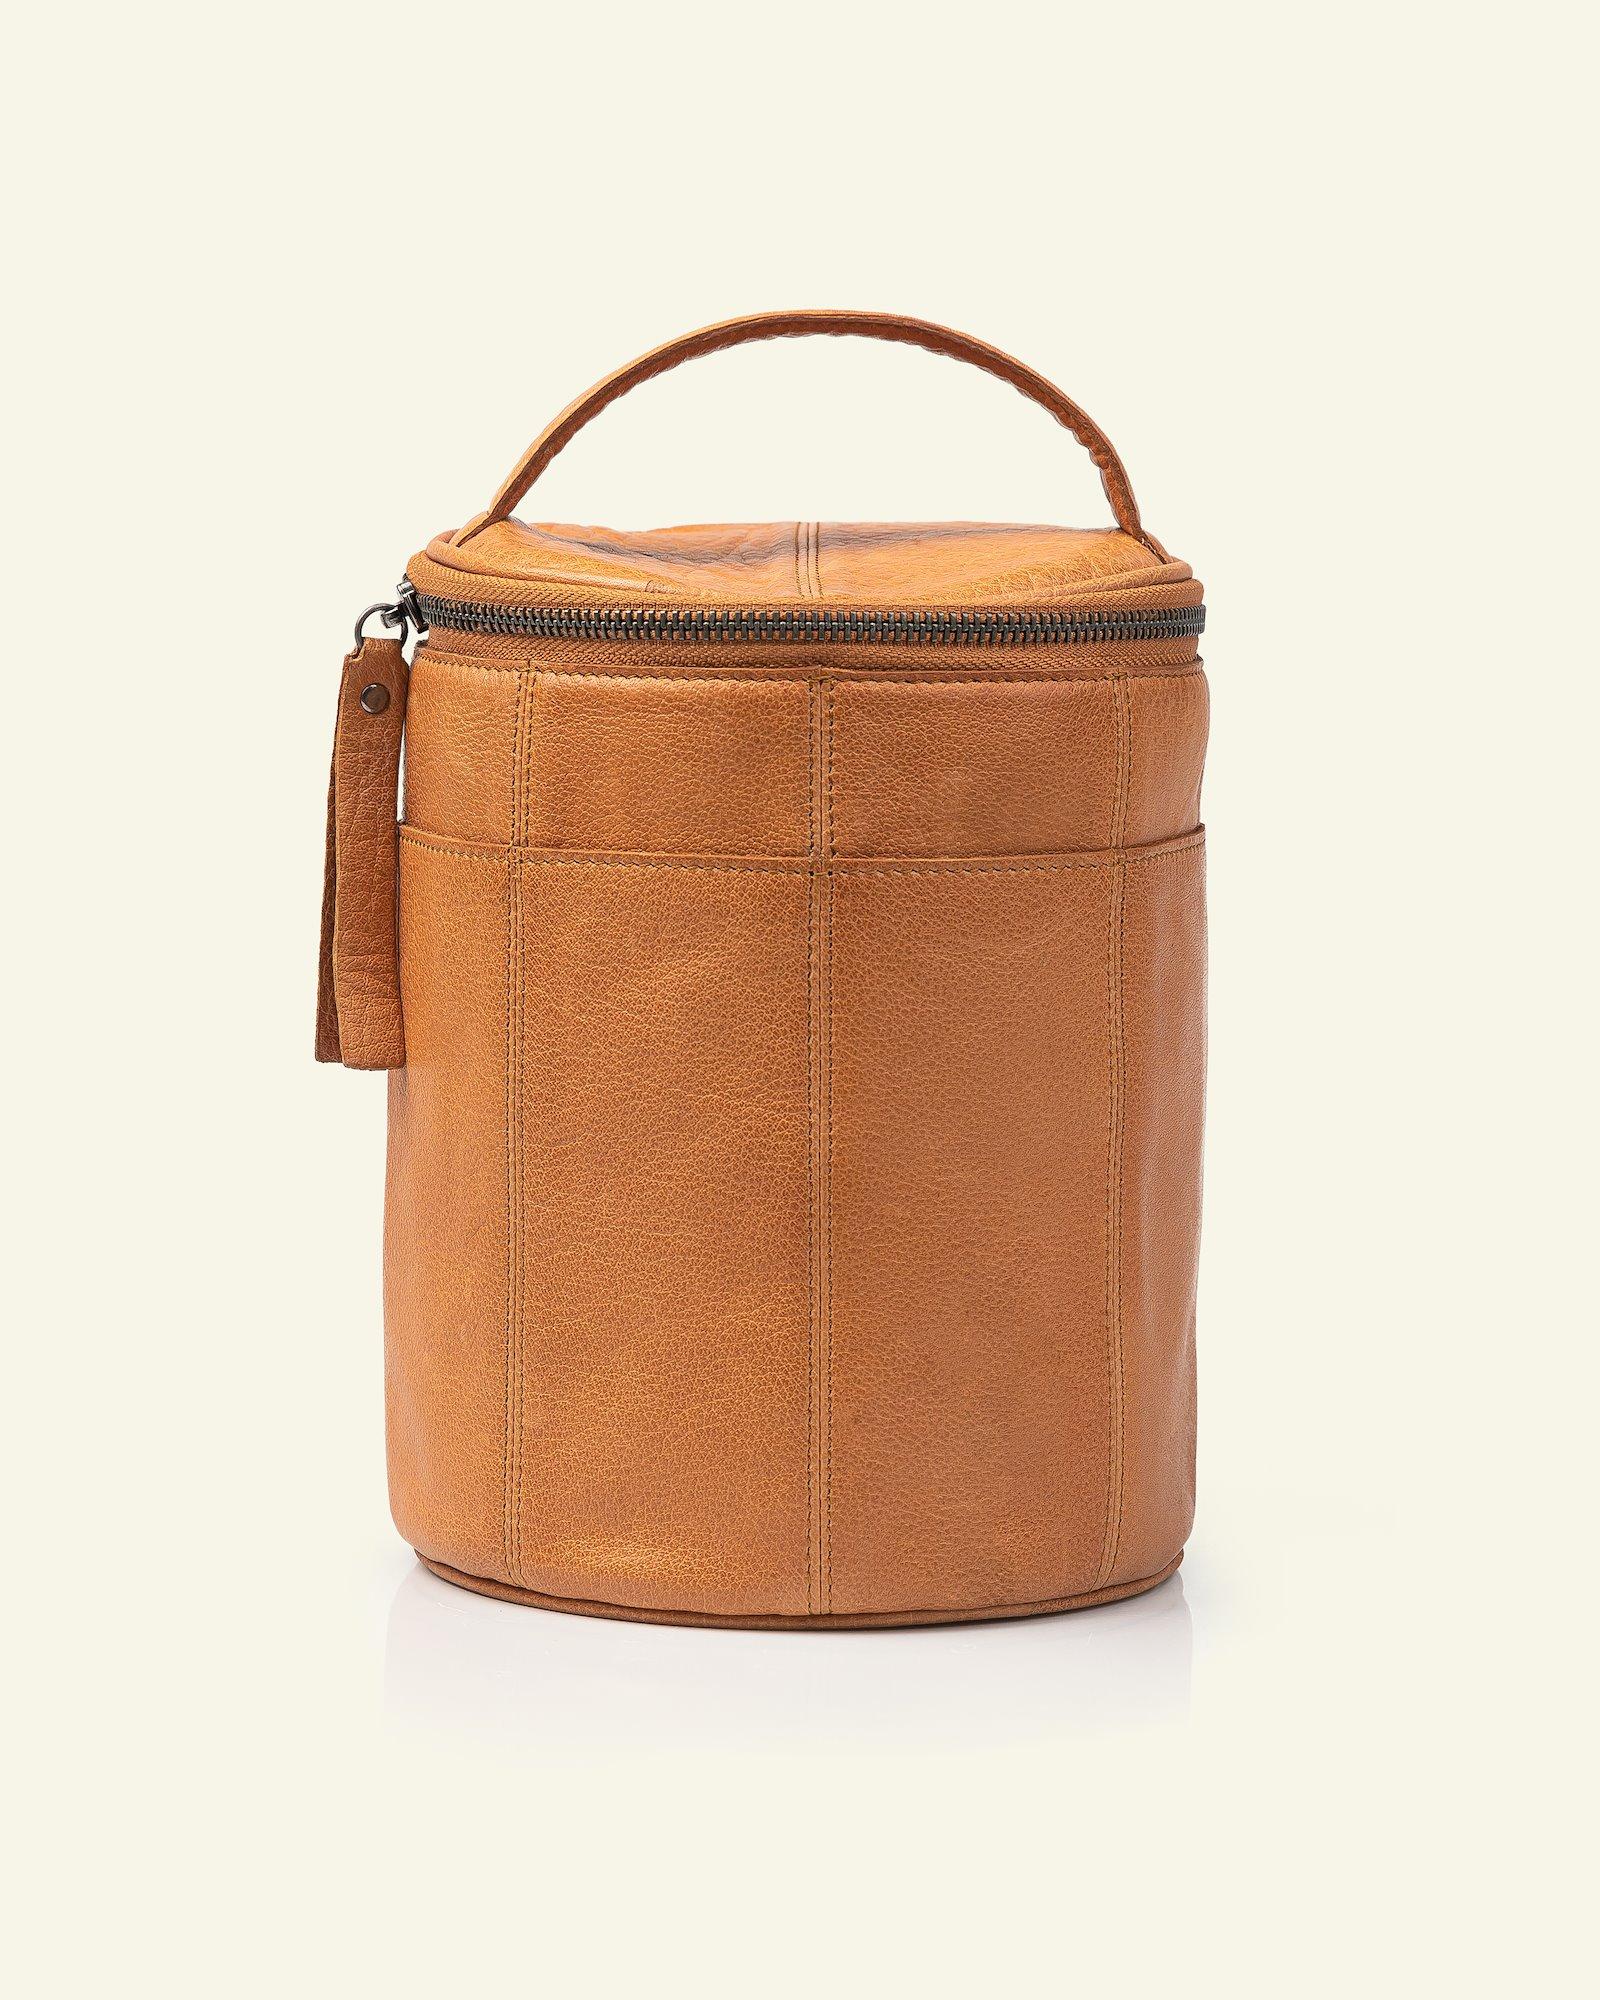 FRAYA leather bag Ø:16xH:21cm brown